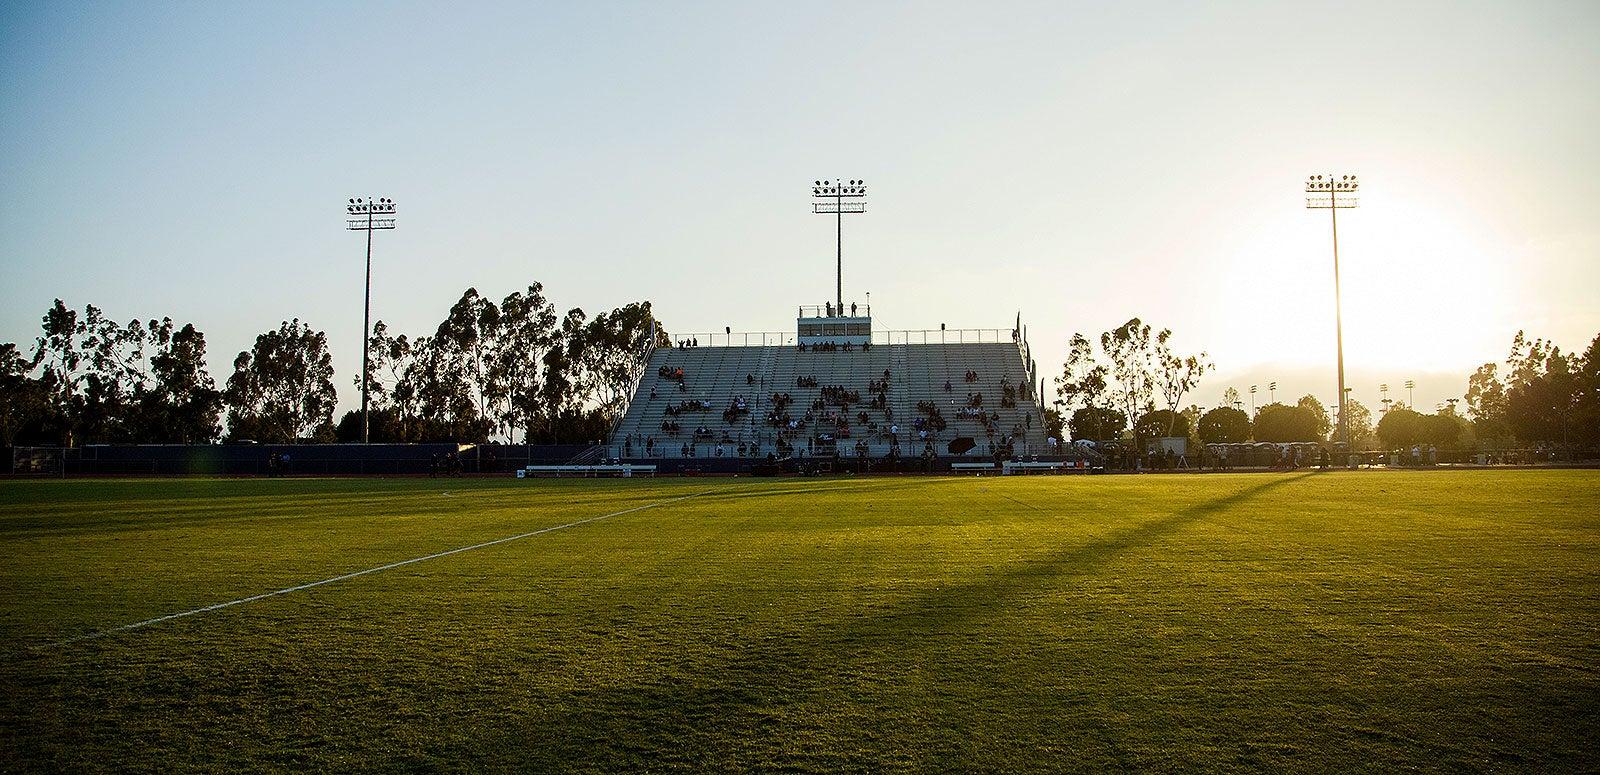 Stadium Info | Dignity Health Sports Park